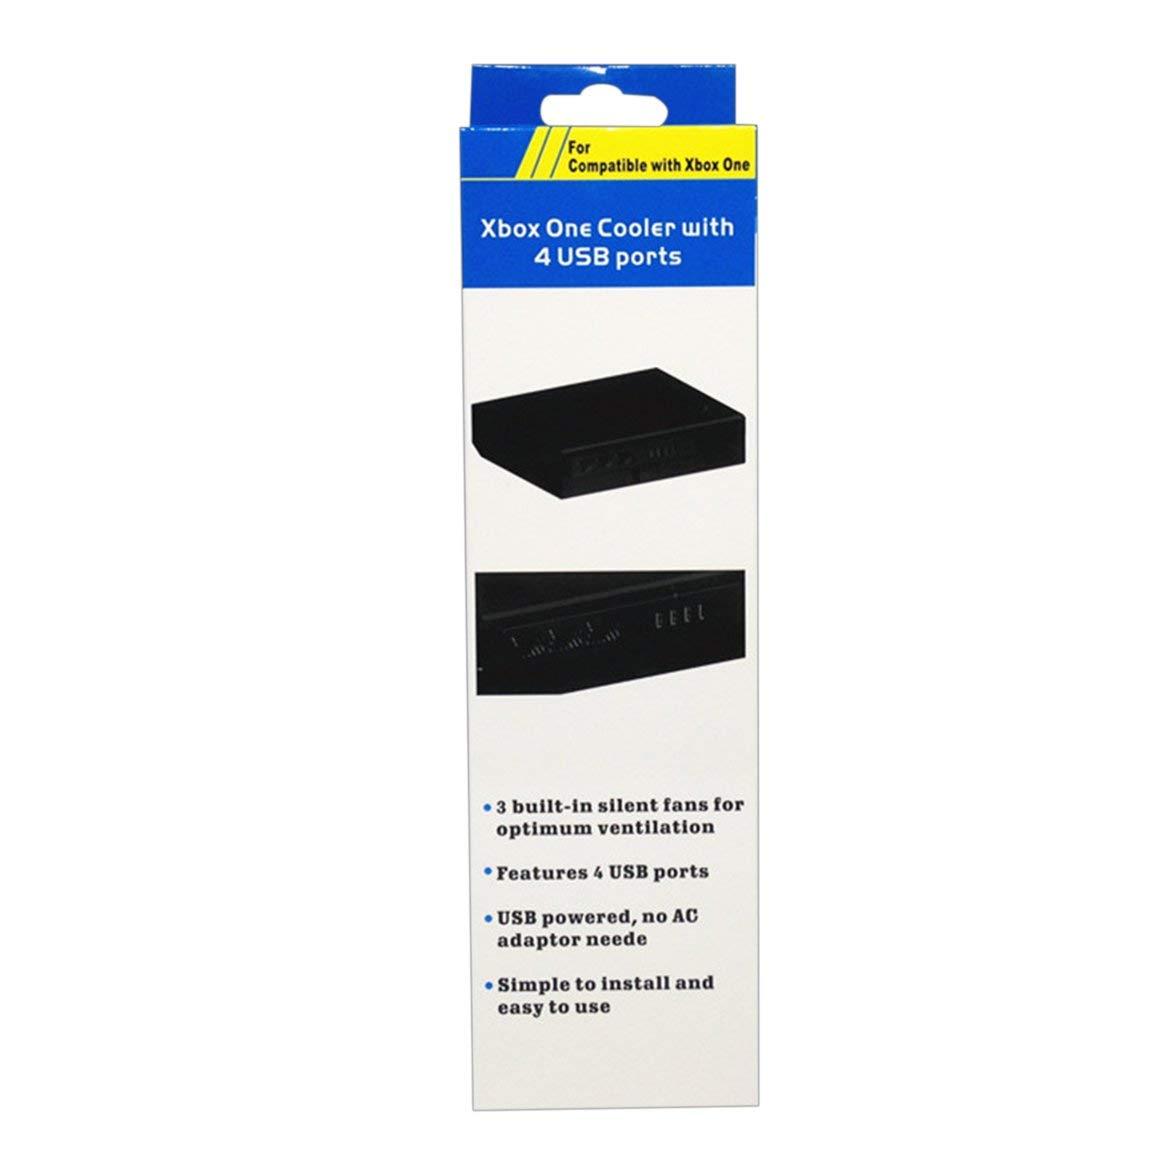 Negro Silenciador de enfriamiento Externo 3 Ventiladores m/ás fr/íos con 4 Puertos de hub USB Hub de Carga para Microsoft para la Consola Xbox One